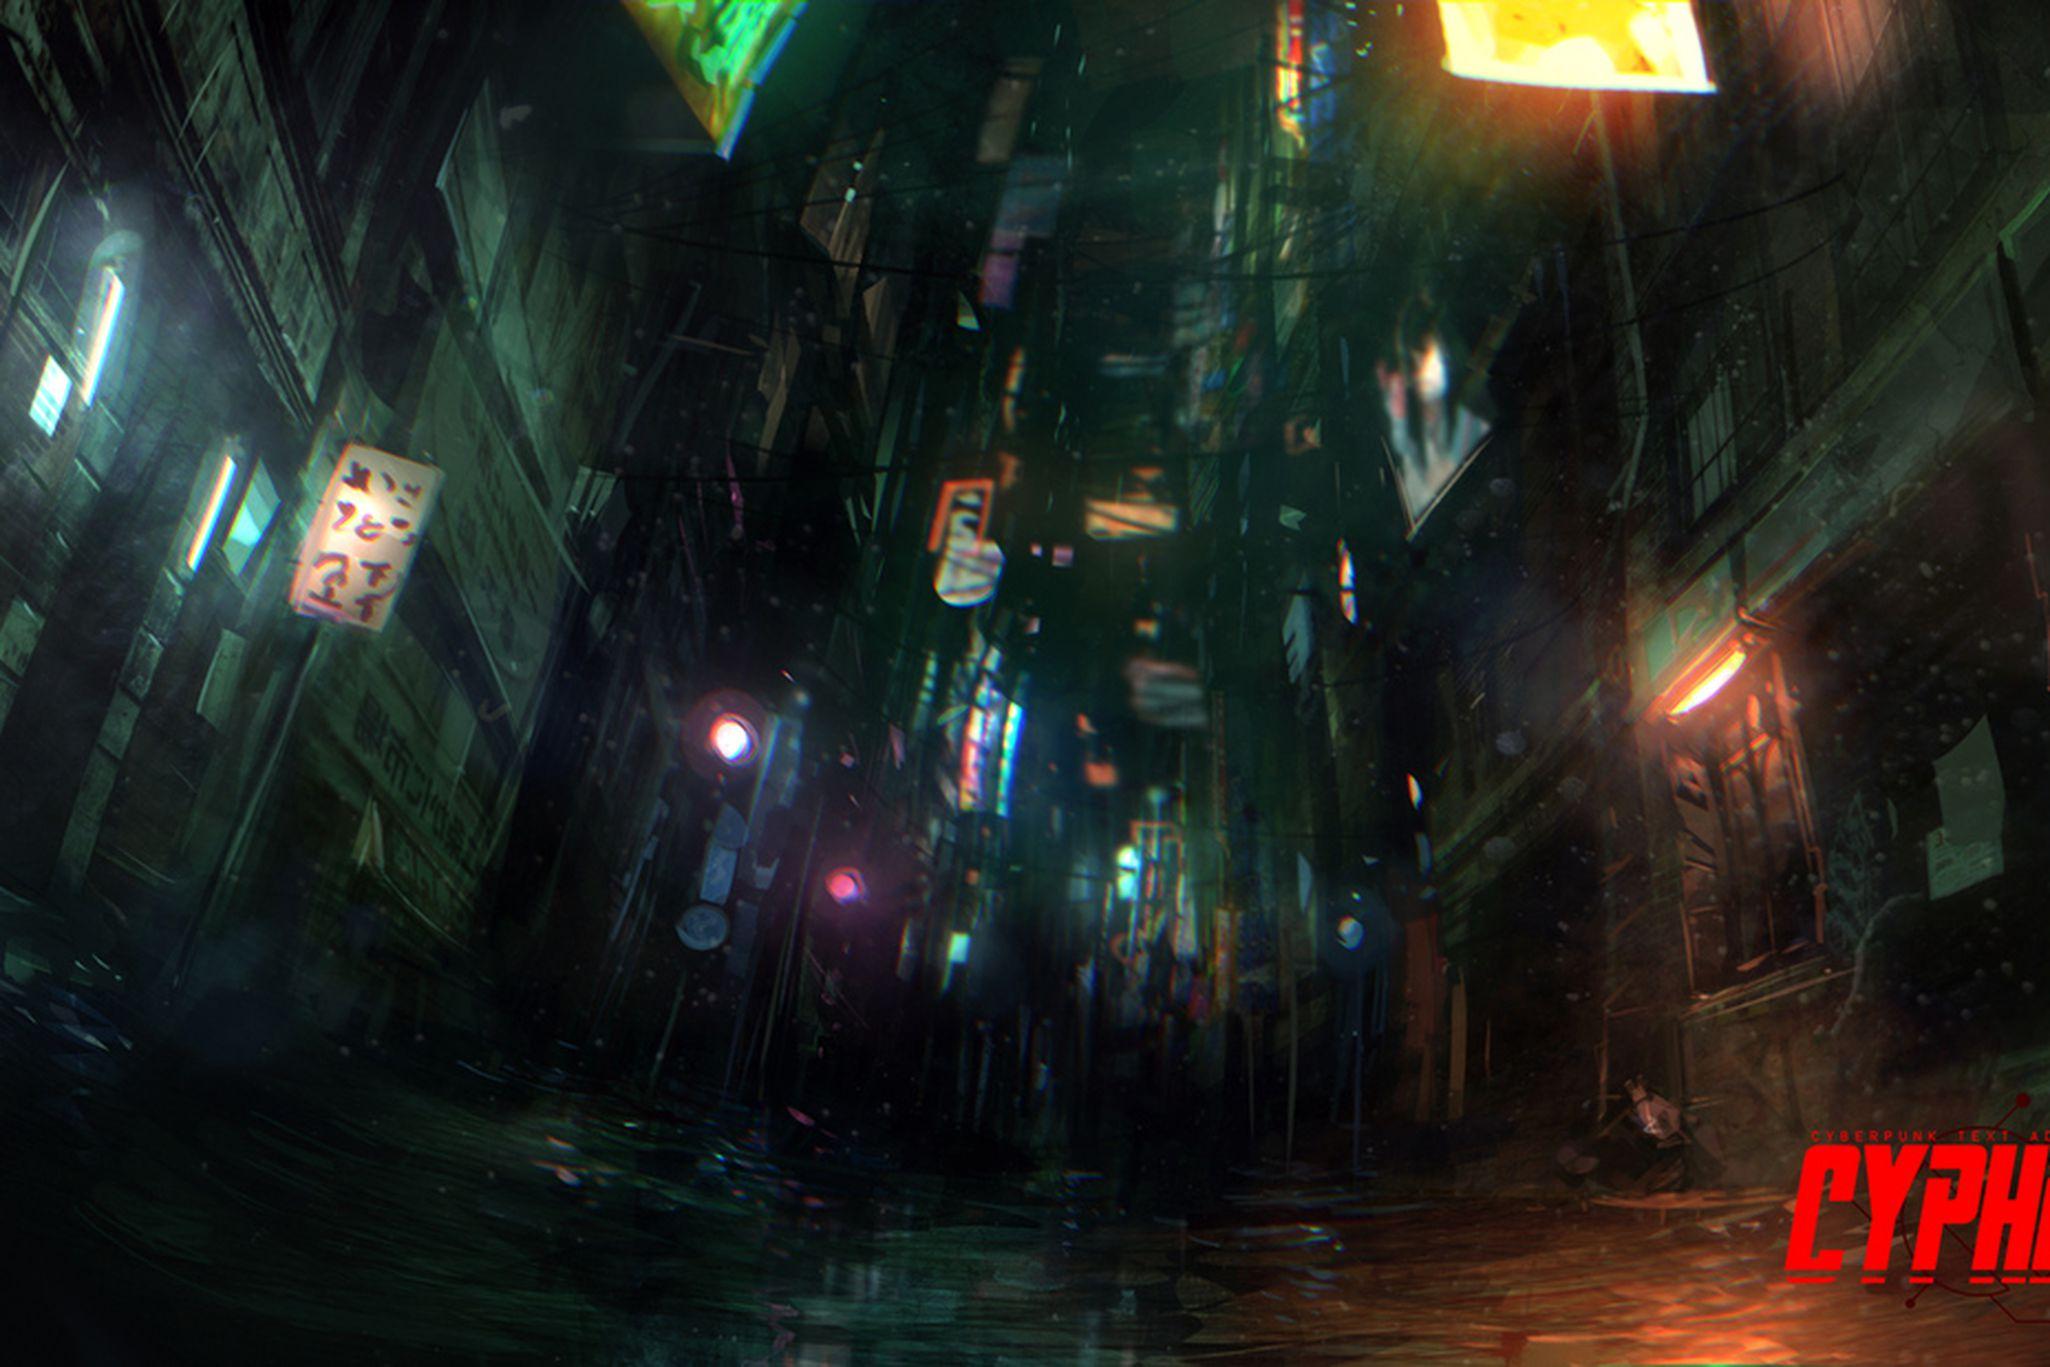 Cyberpunk meets interactive fiction: the art of 'Cypher